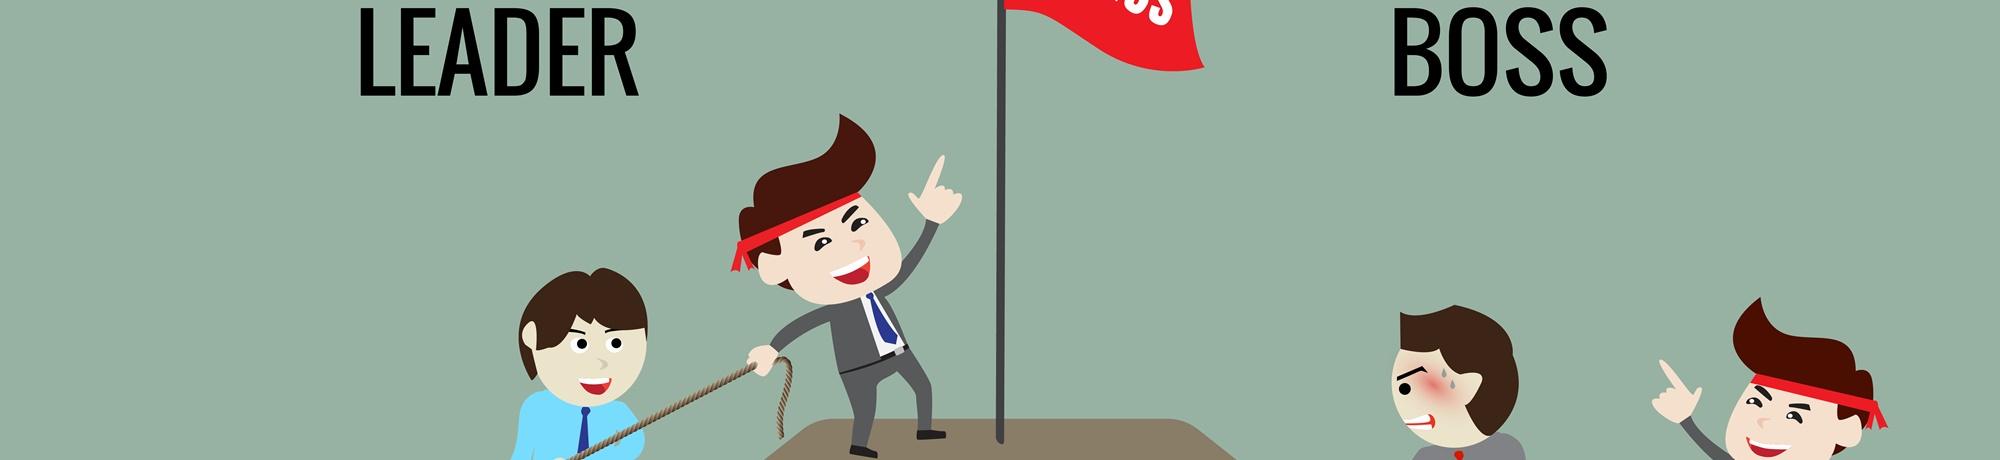 lider-e-chefe